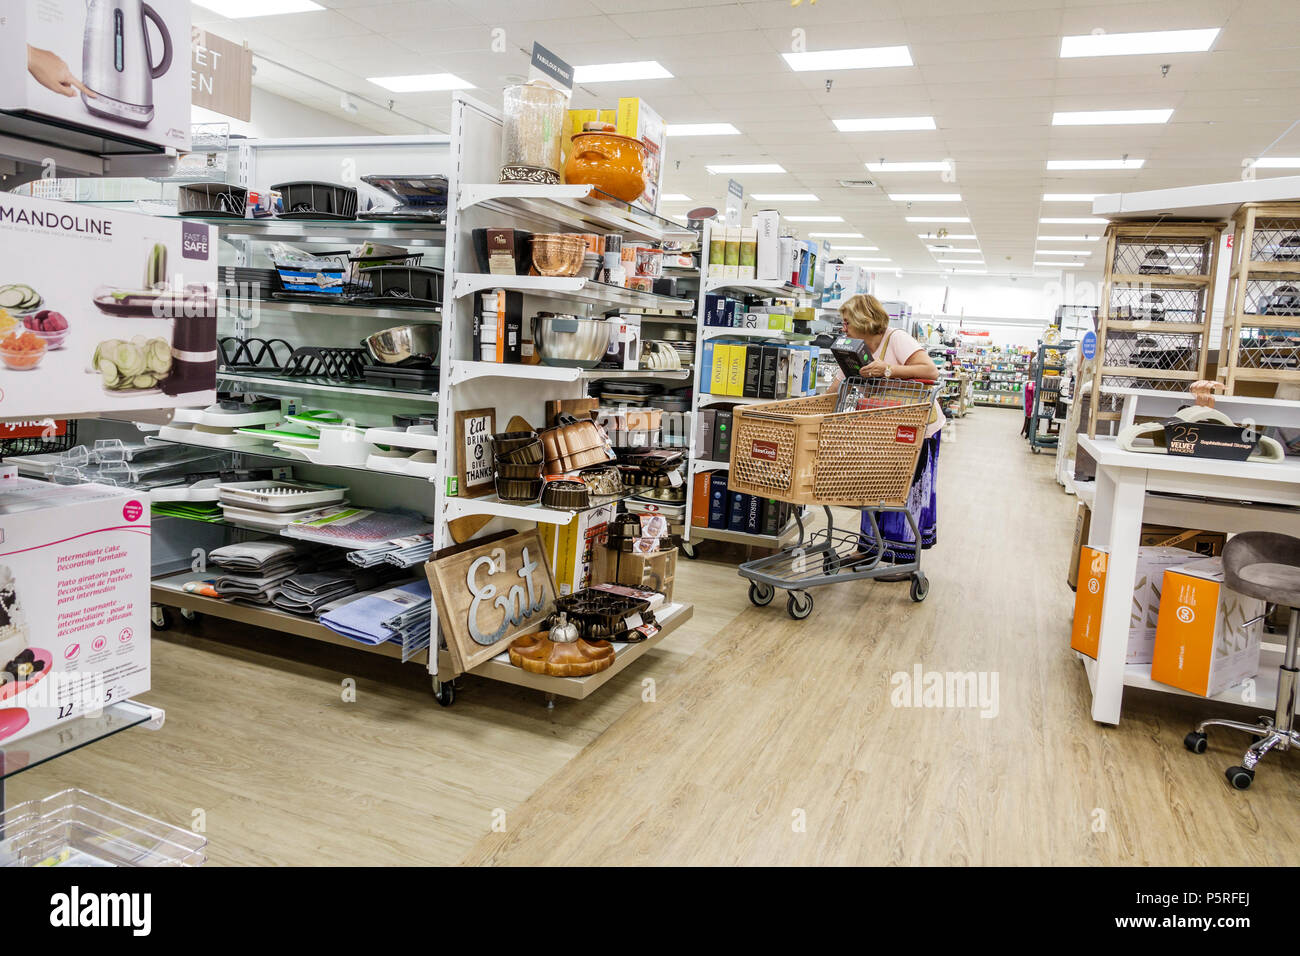 Stuart Florida HomeGoods Discount Home Furnishings Decor Display Sale Shopping Interior Aisle Cart Woman Shelves